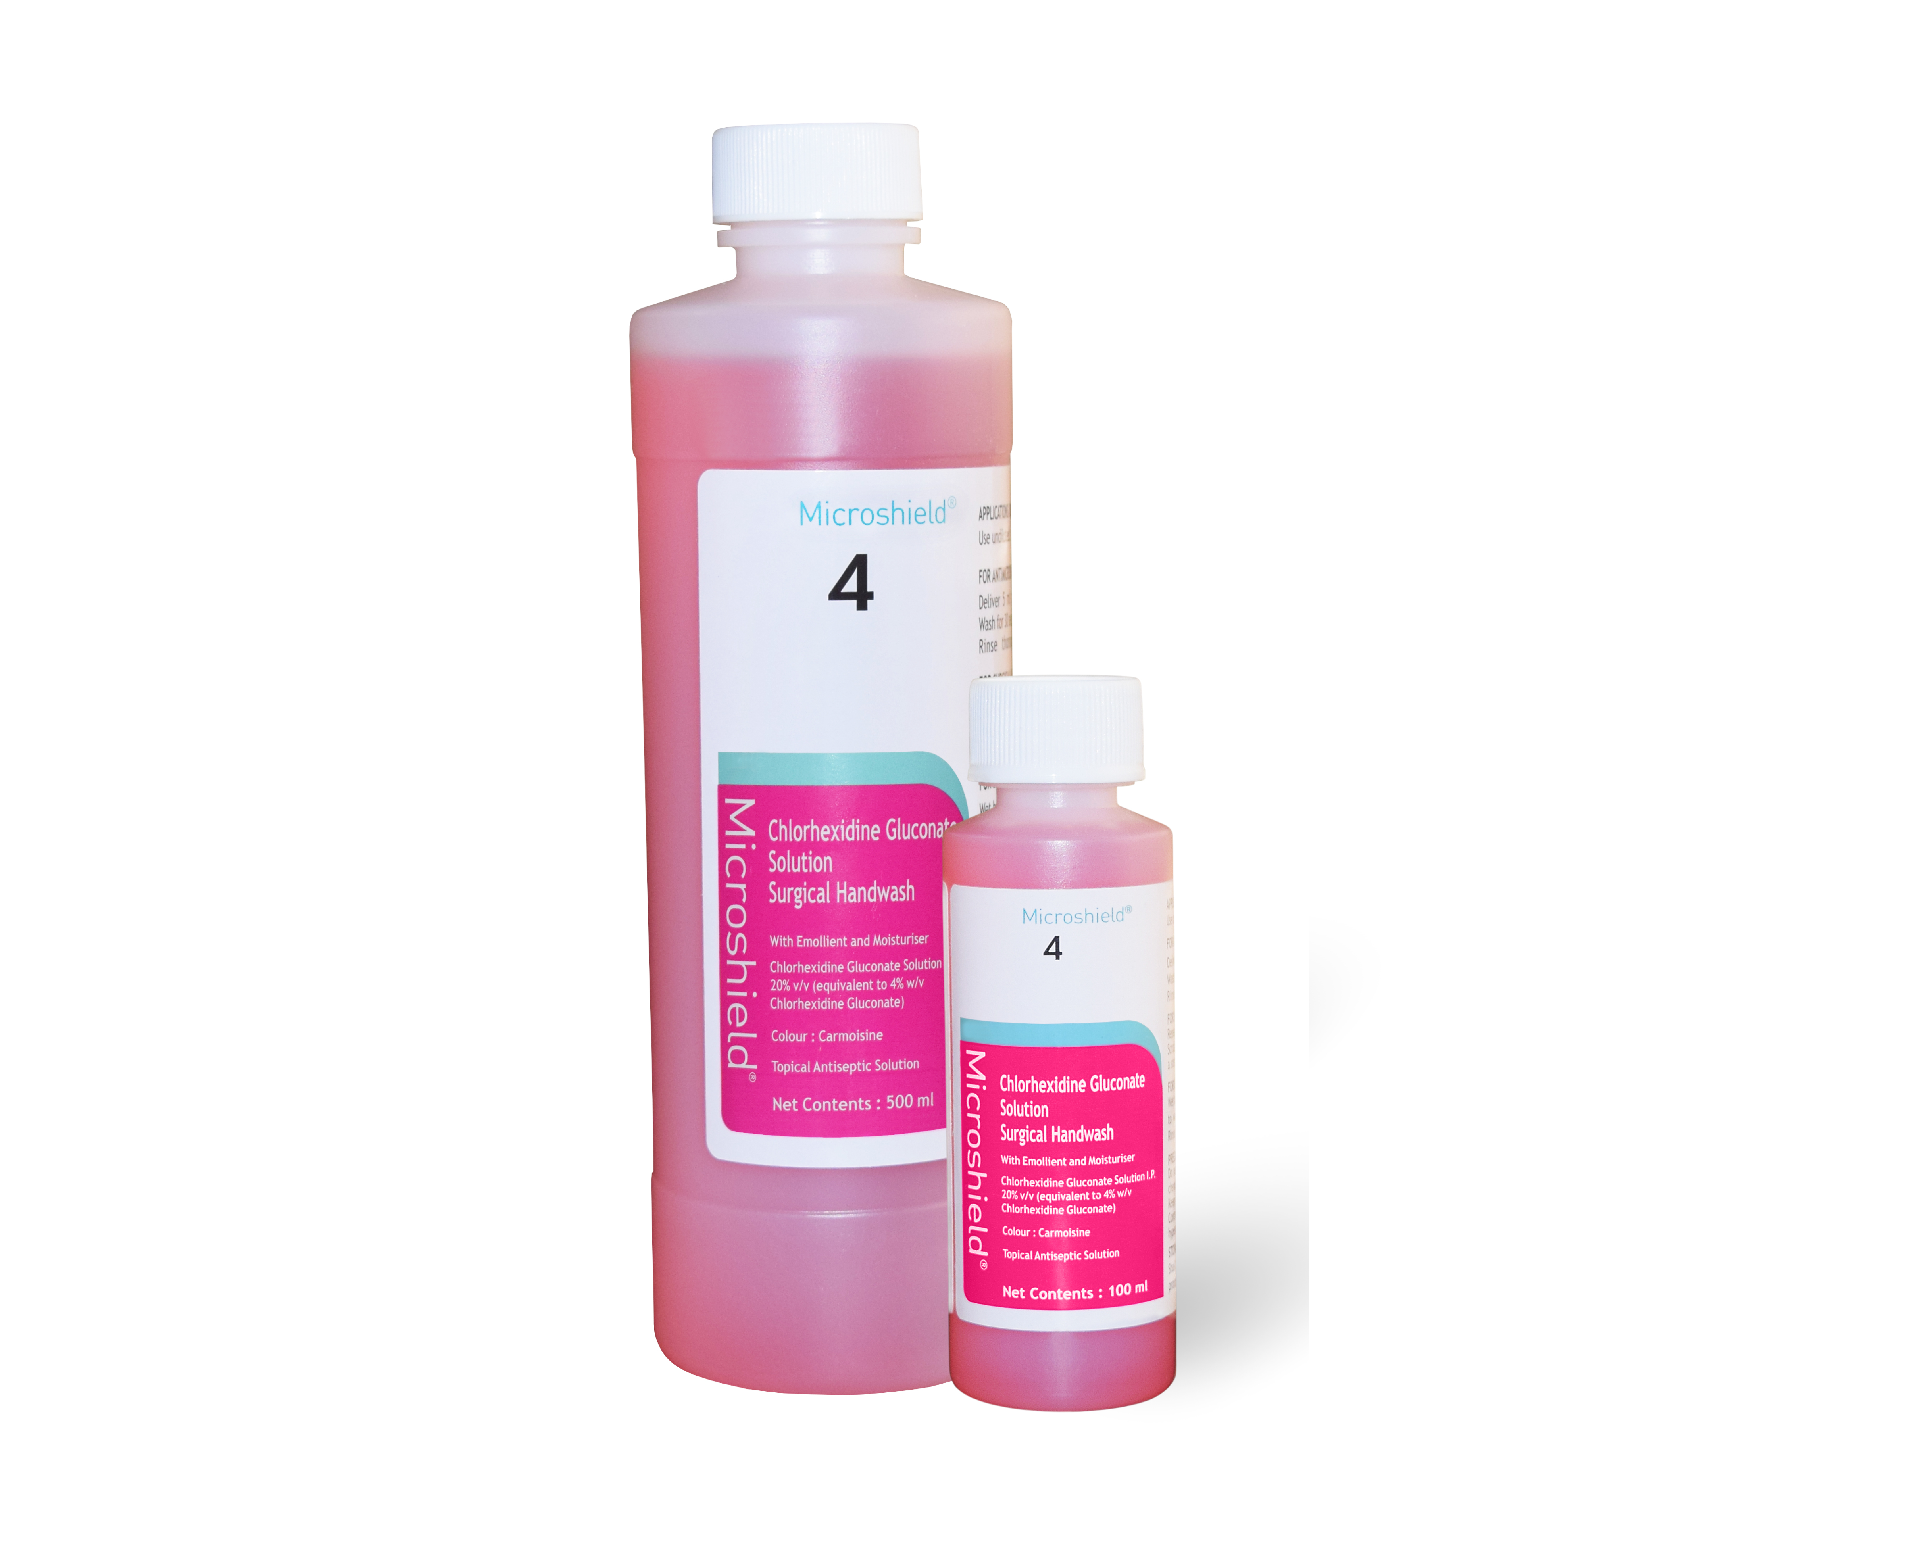 schülke - MICROSHIELD® 4 Chlorhexidine